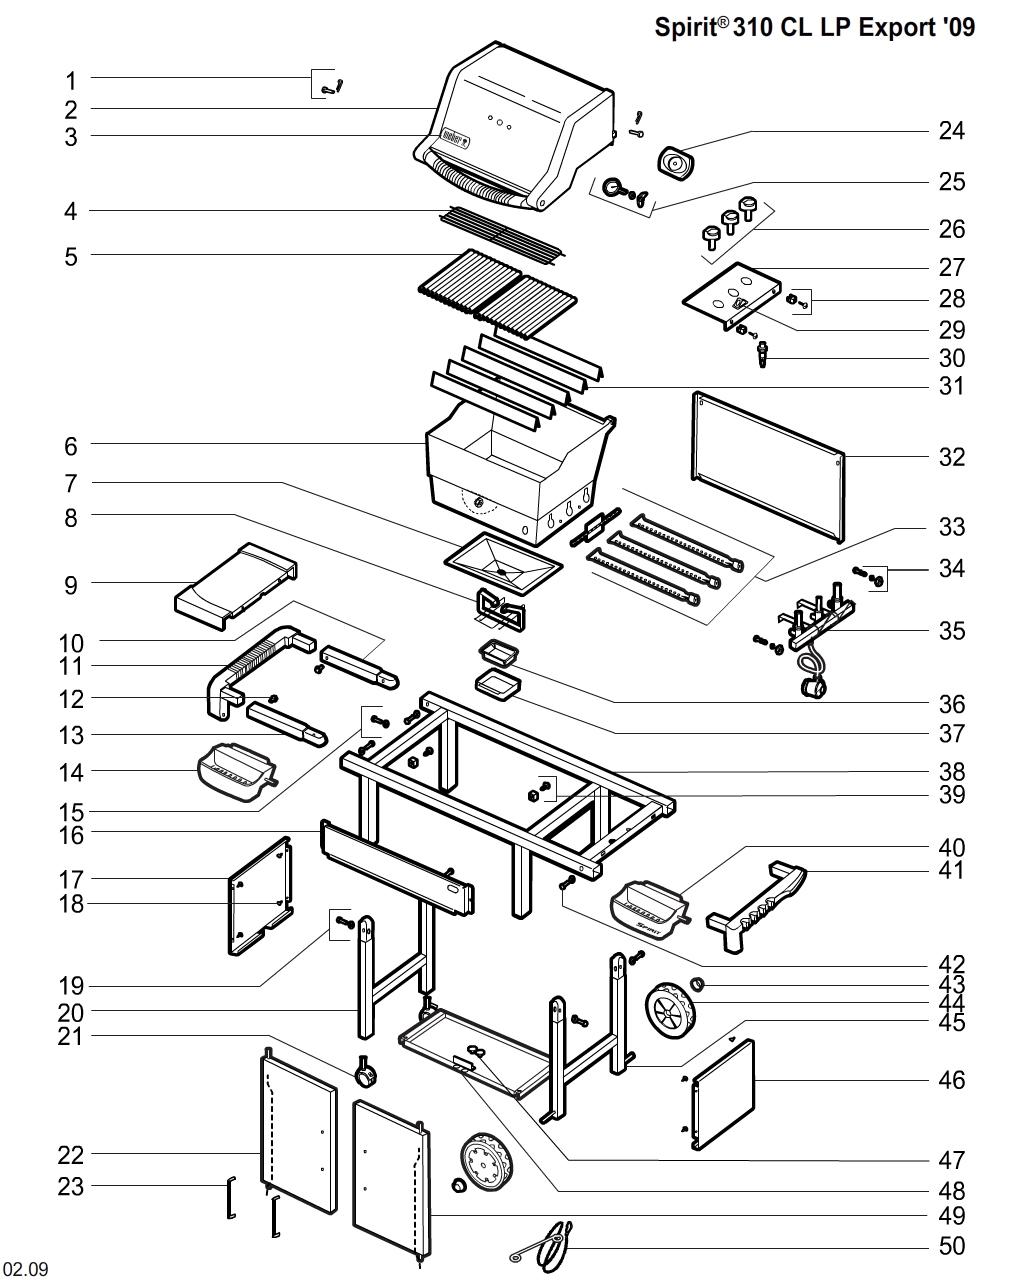 Schematic Image 8821074